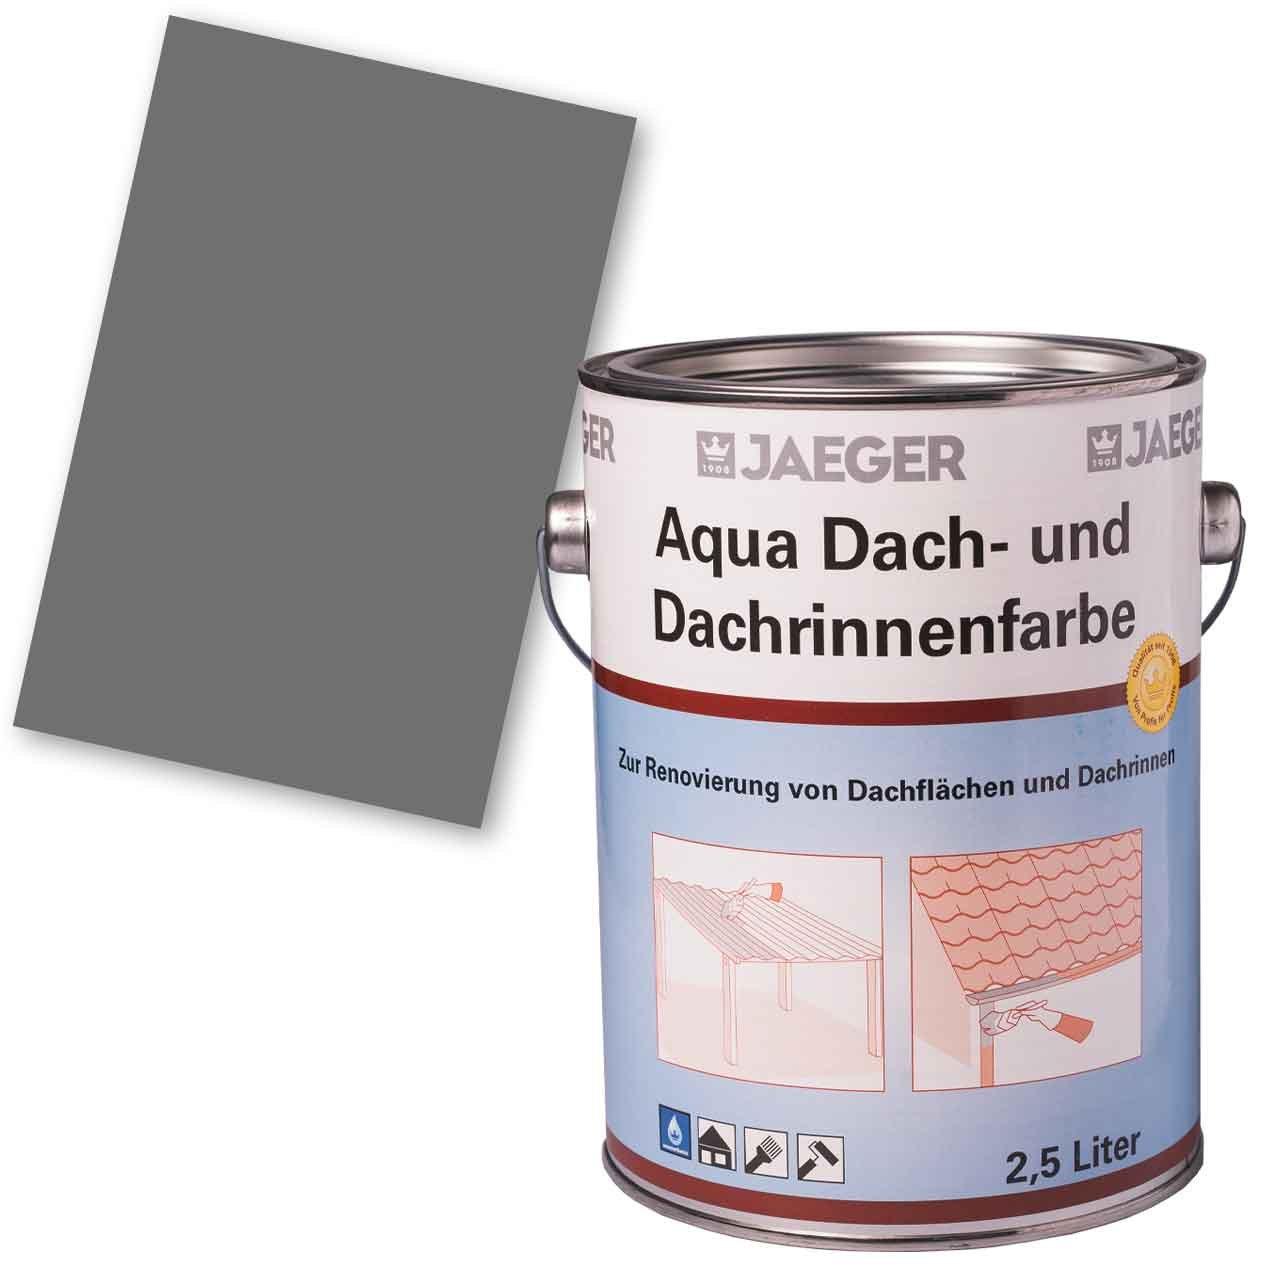 Aqua Dach- und Dachrinnenfarbe, anthrazit, 2,5 l JAEGER